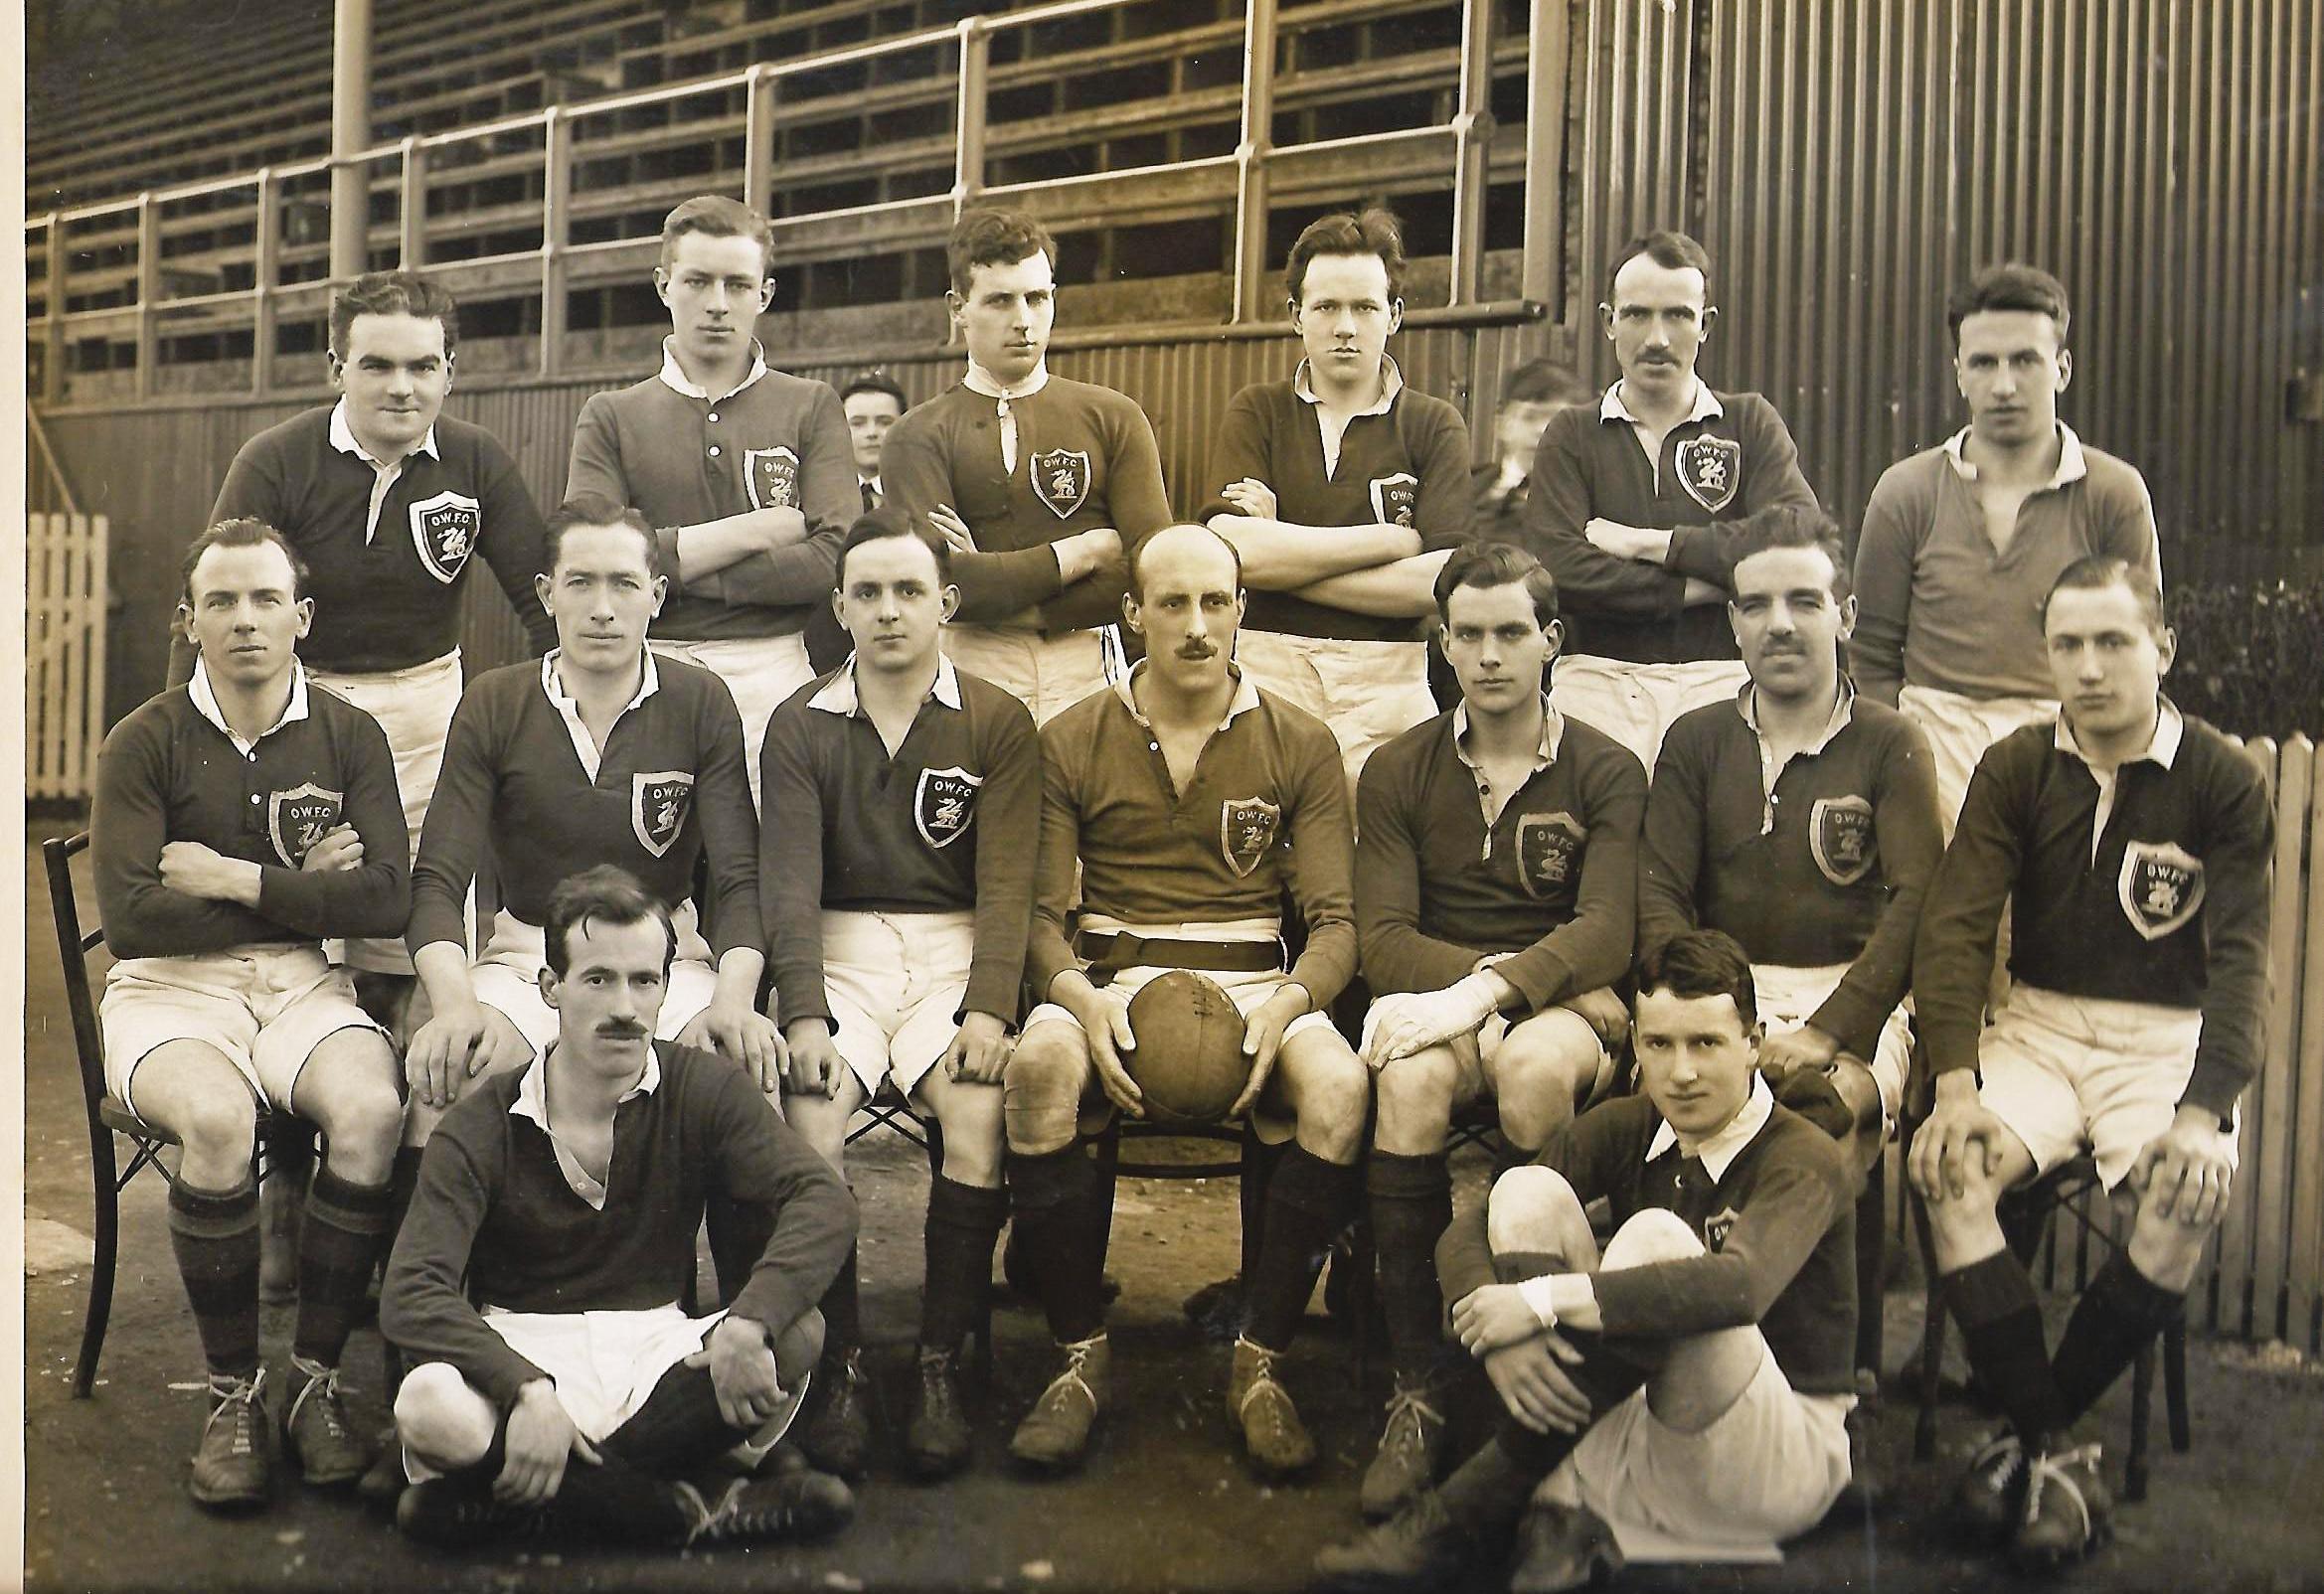 team photos 1920 1930 old wesley